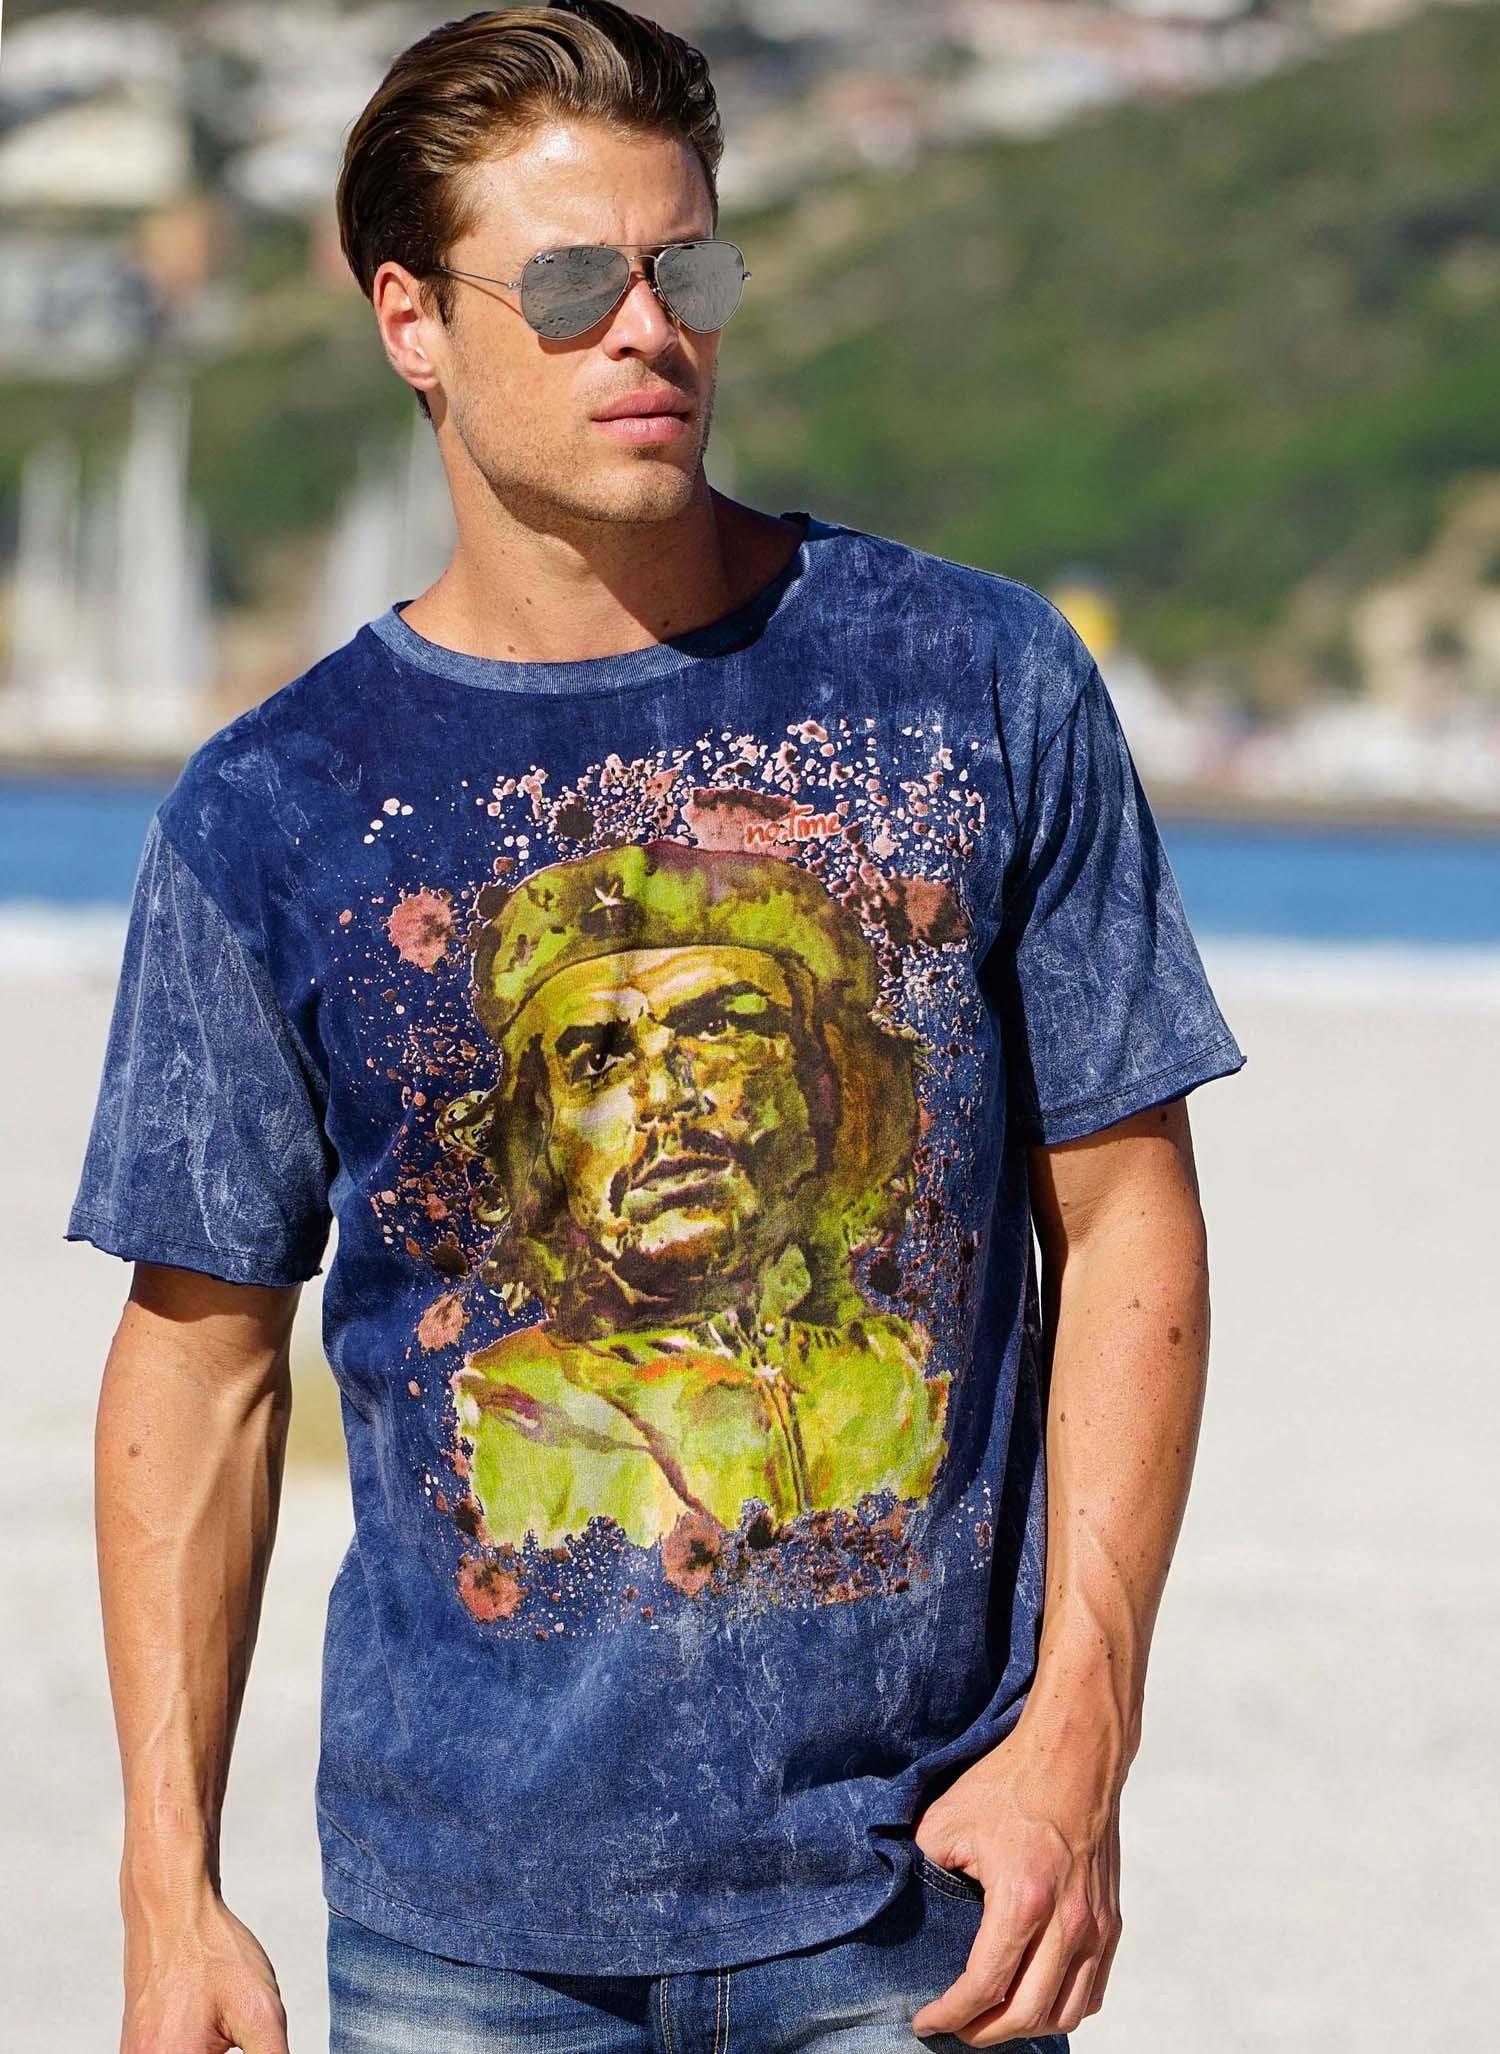 H-KA-Shirt,Che indigo L 049 - 1 - Ronja.ch